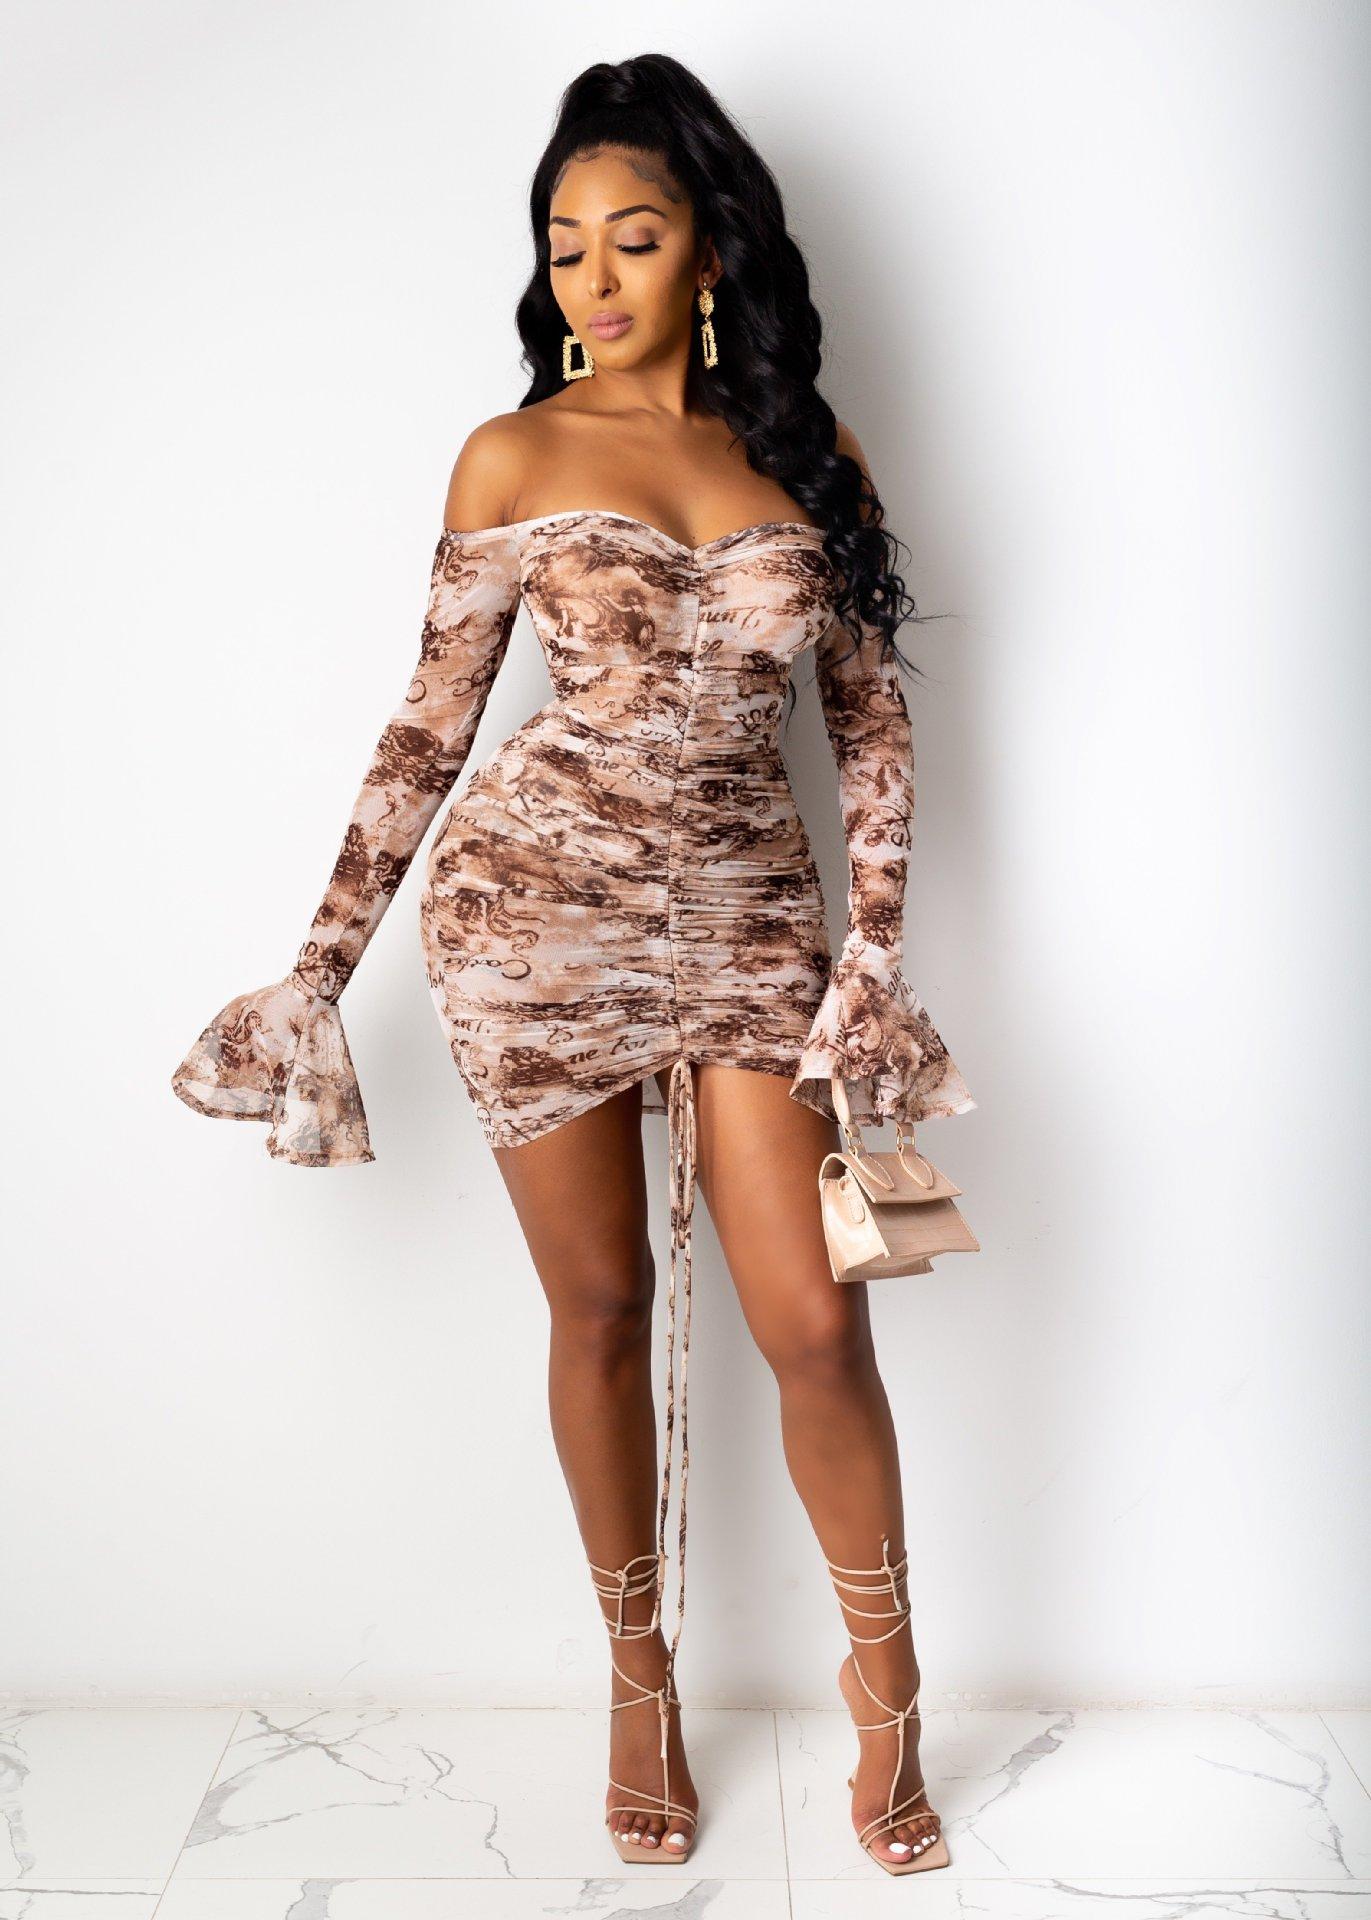 Hcdee8cf911184f23882424cfe3d37b14I - Adogirl Snake Print Long Sleeve Dress Women Evening Party Night Dresses Sexy Off Shoulder Drawstring Bodycon Slim Mini Dress